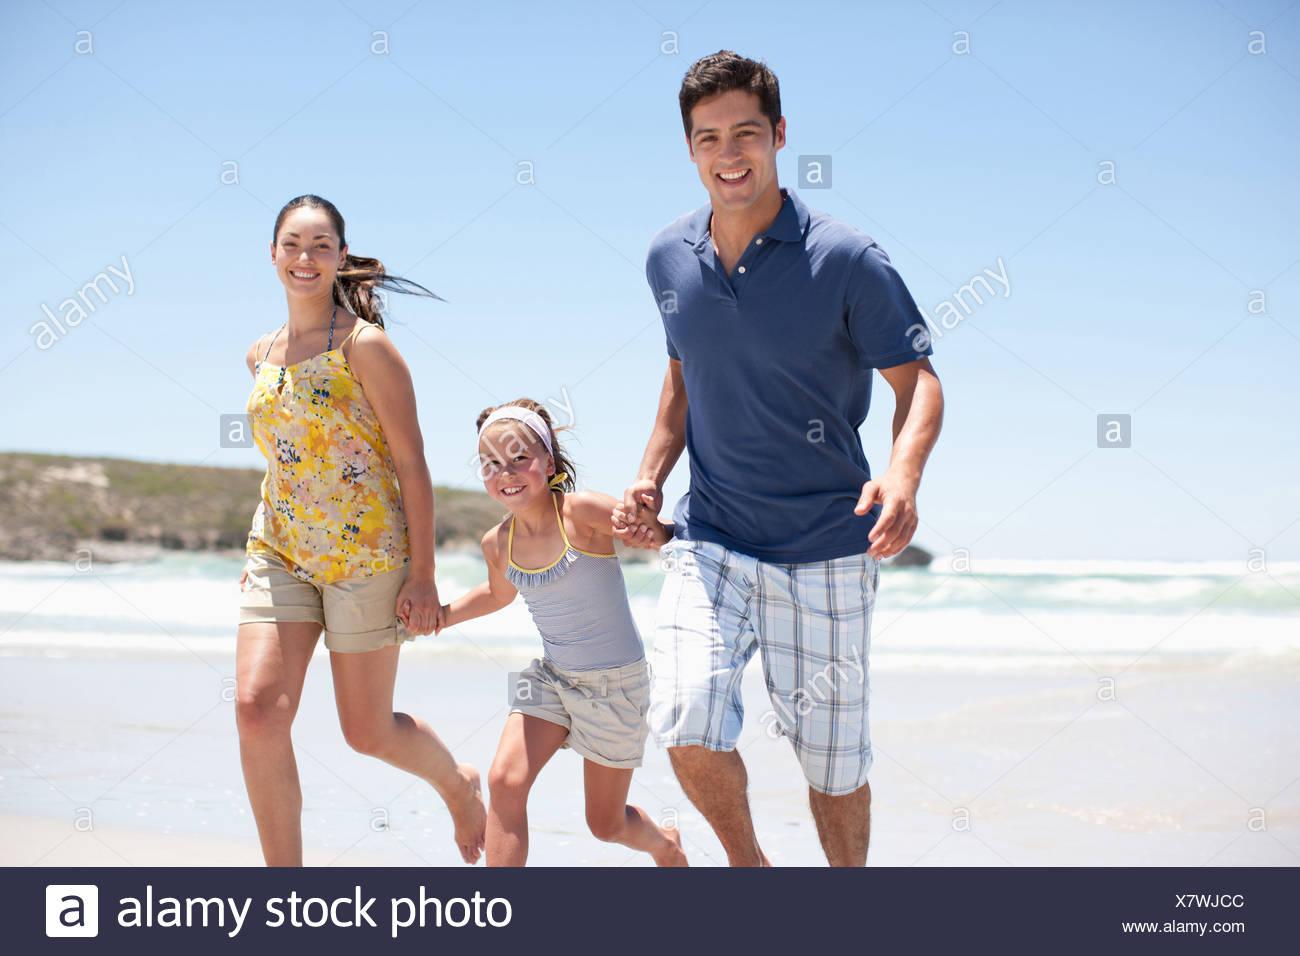 Family running on beach - Stock Image